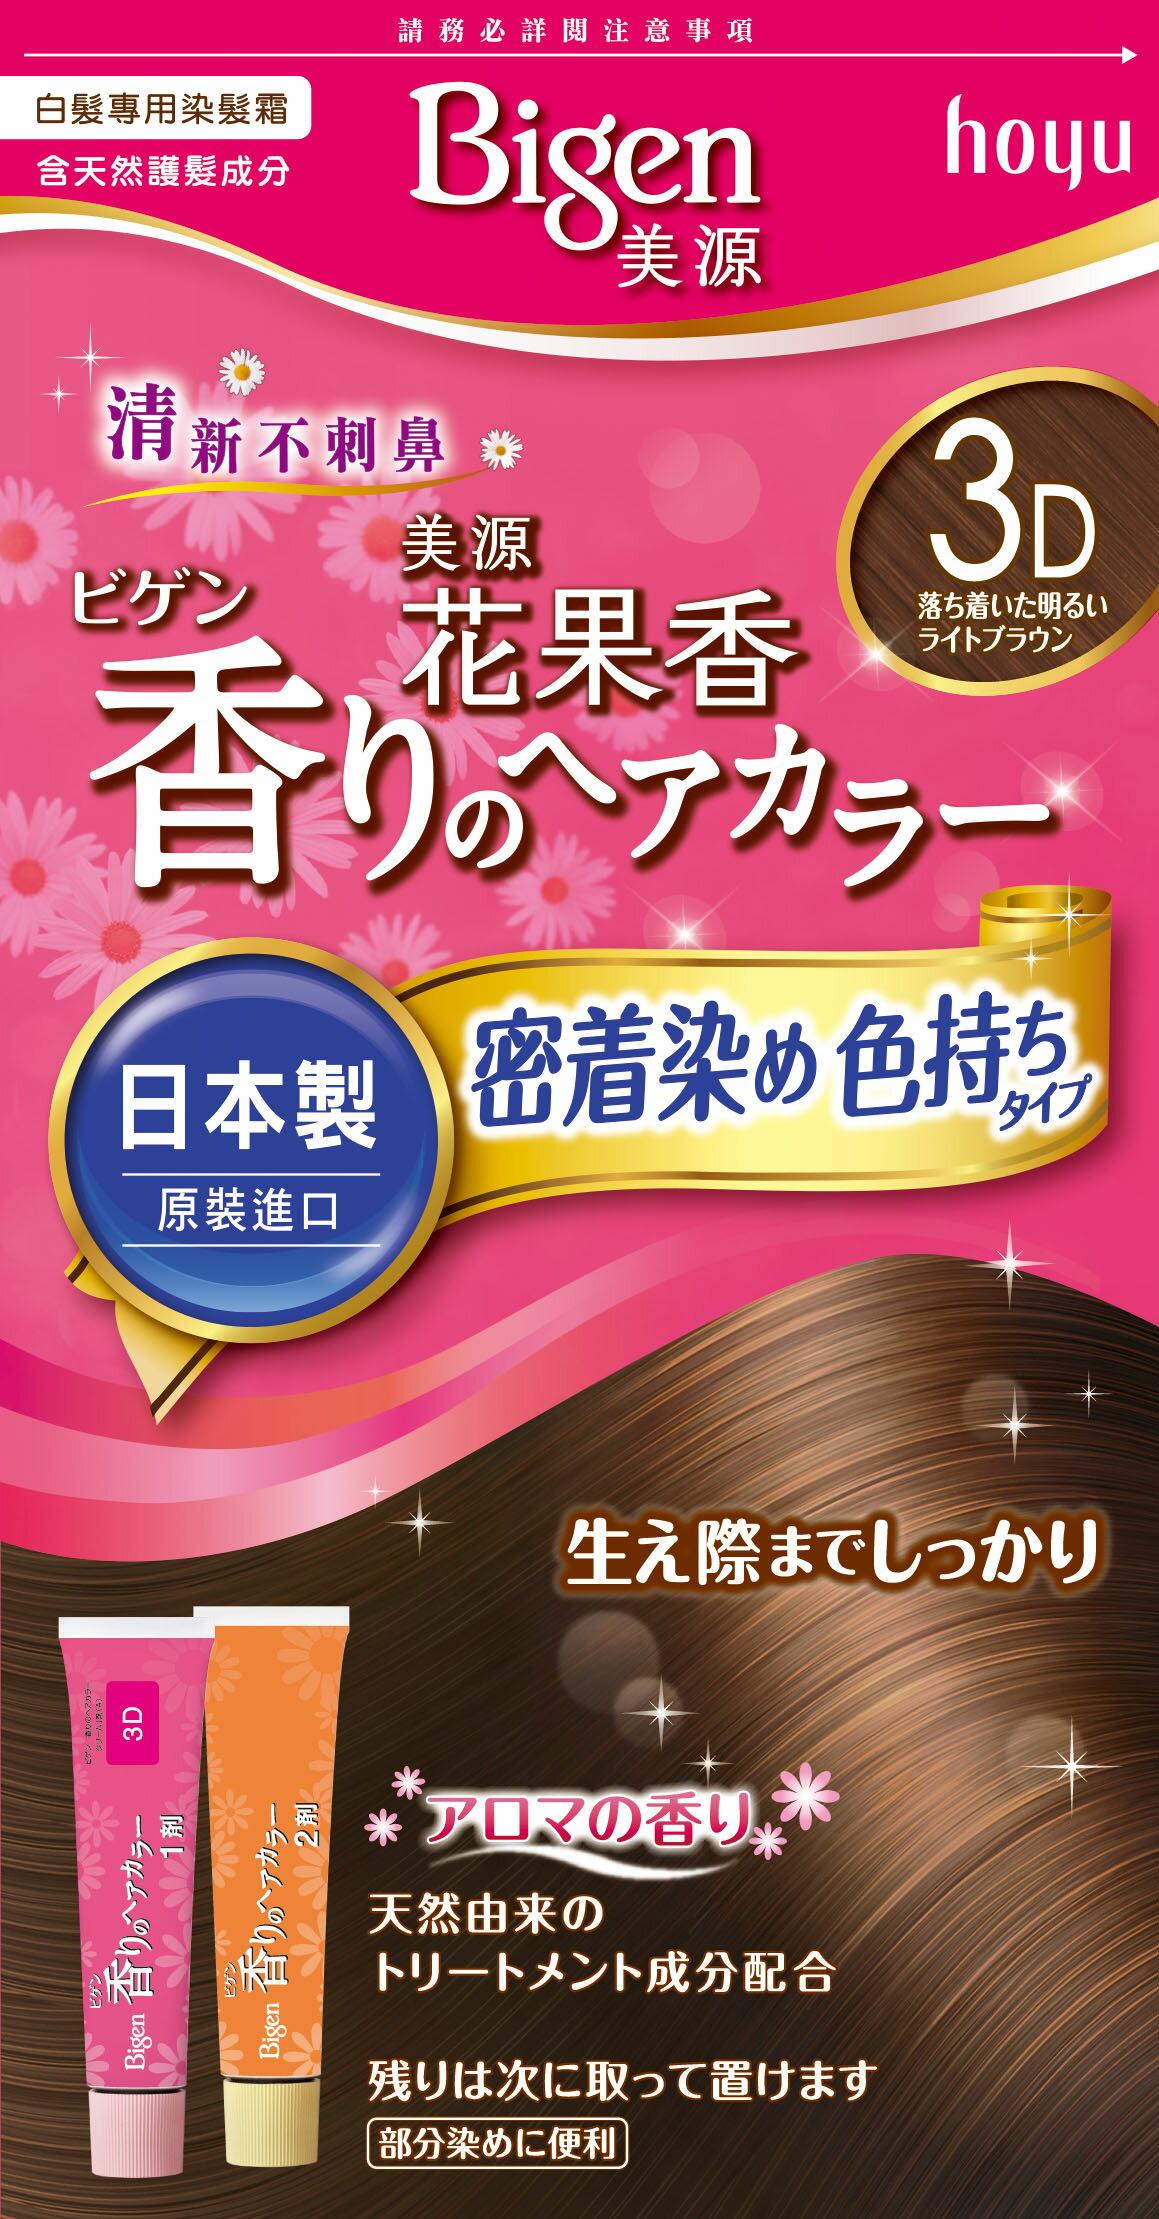 Bigen美源 花果香快速染髮霜【3D】自然淺棕色